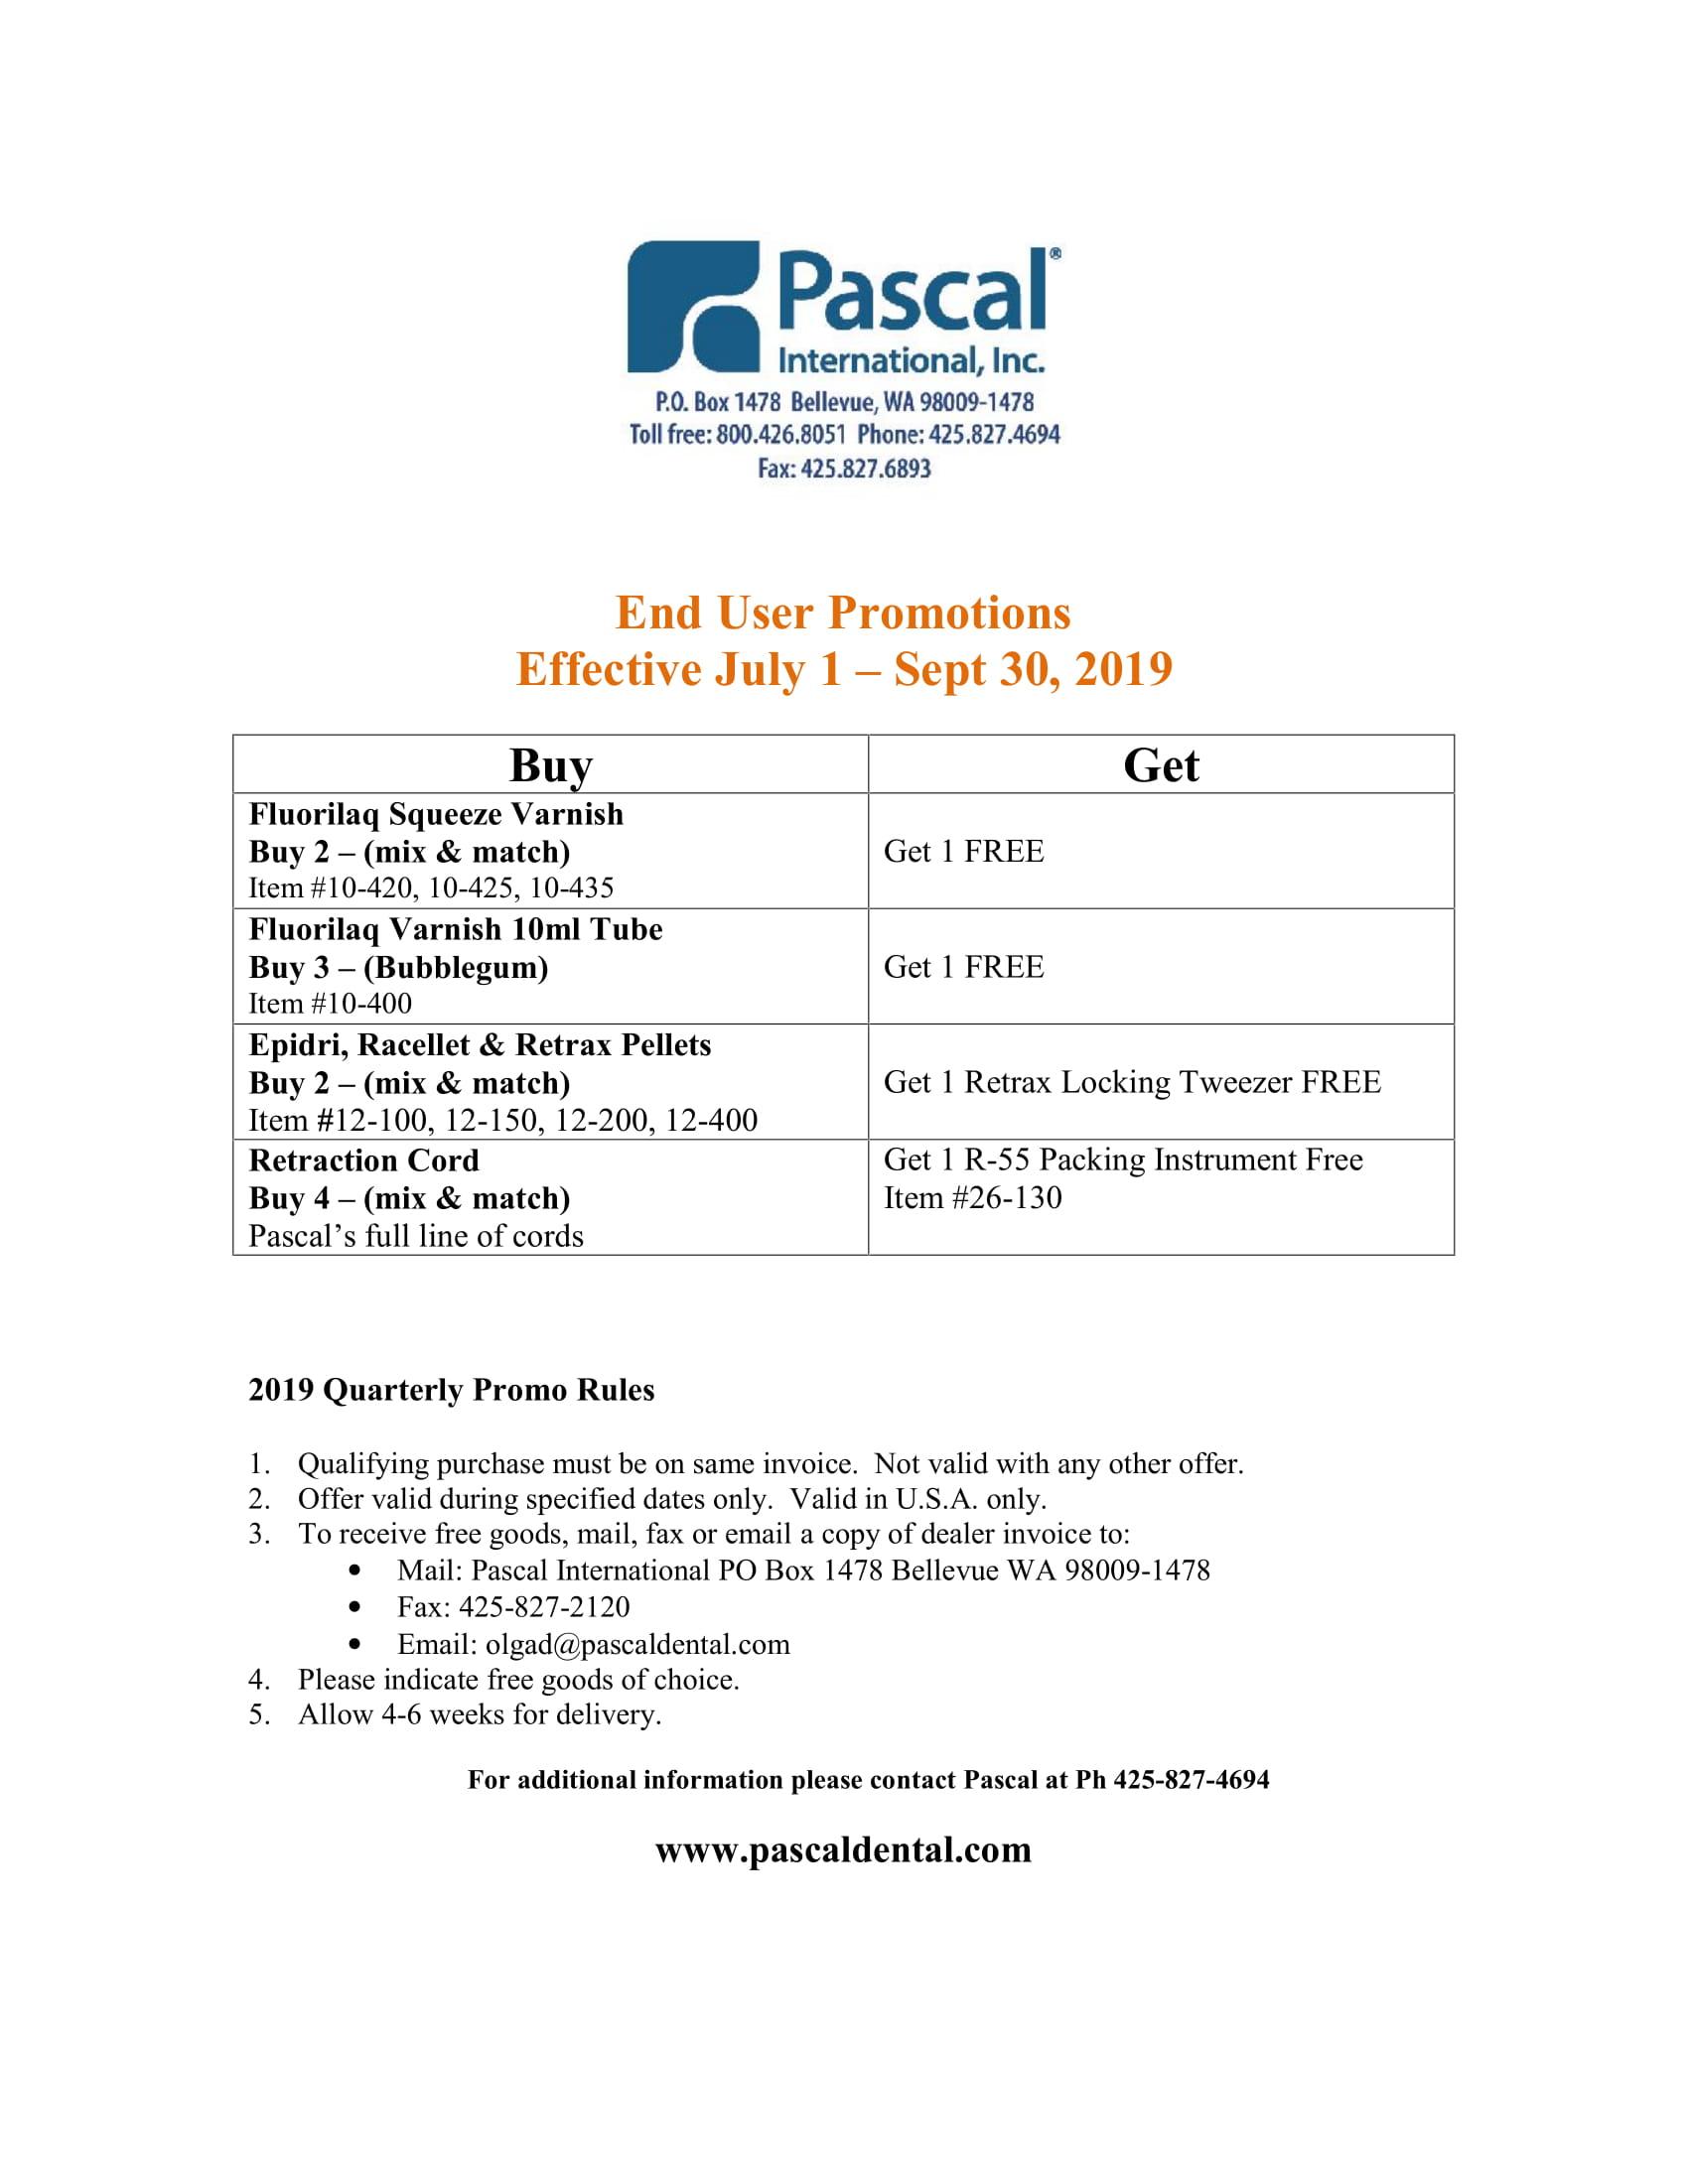 Q3 PASCAL (CUSTOMER)-1.jpg